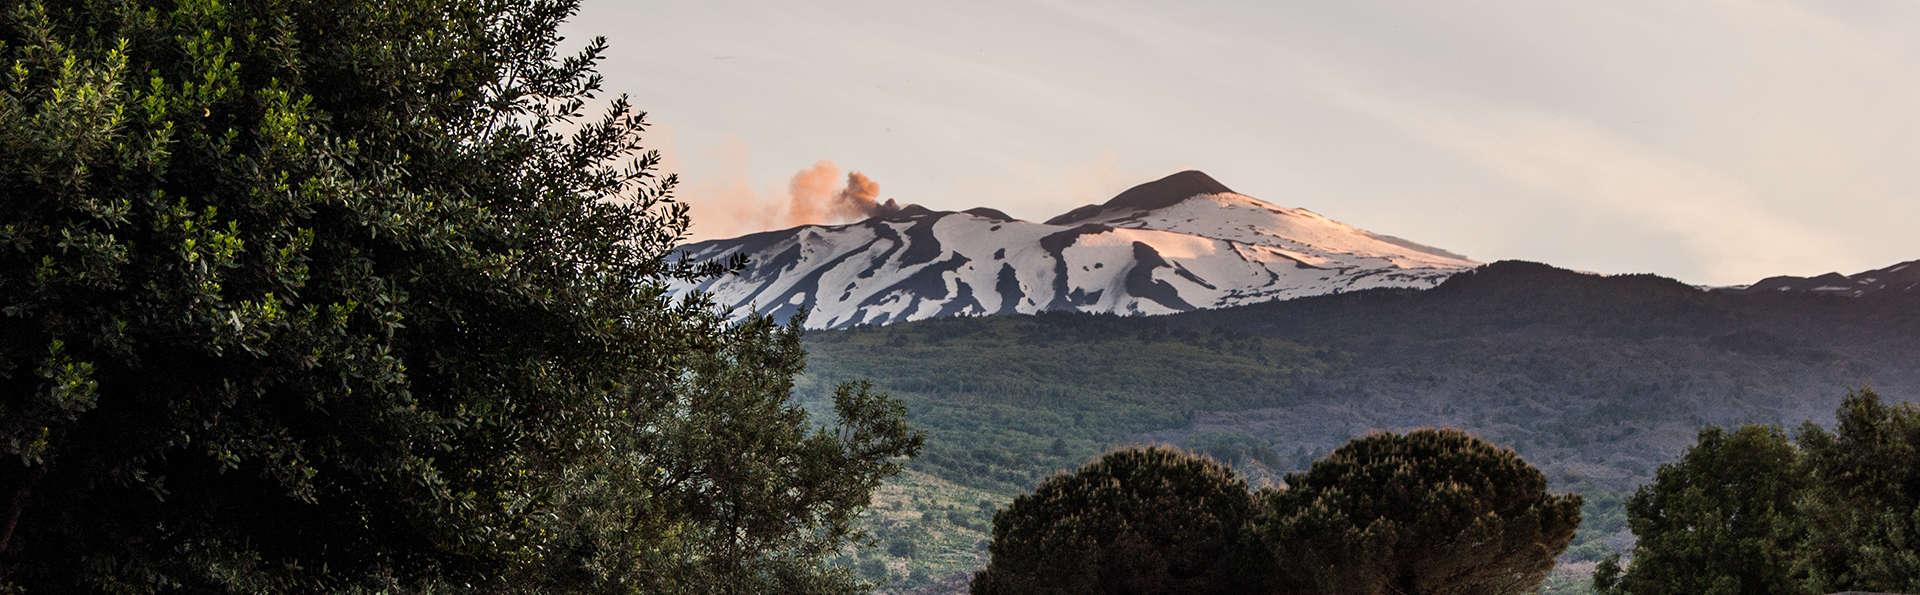 Il Picciolo Etna Golf Resort - Edit_Destination2.jpg